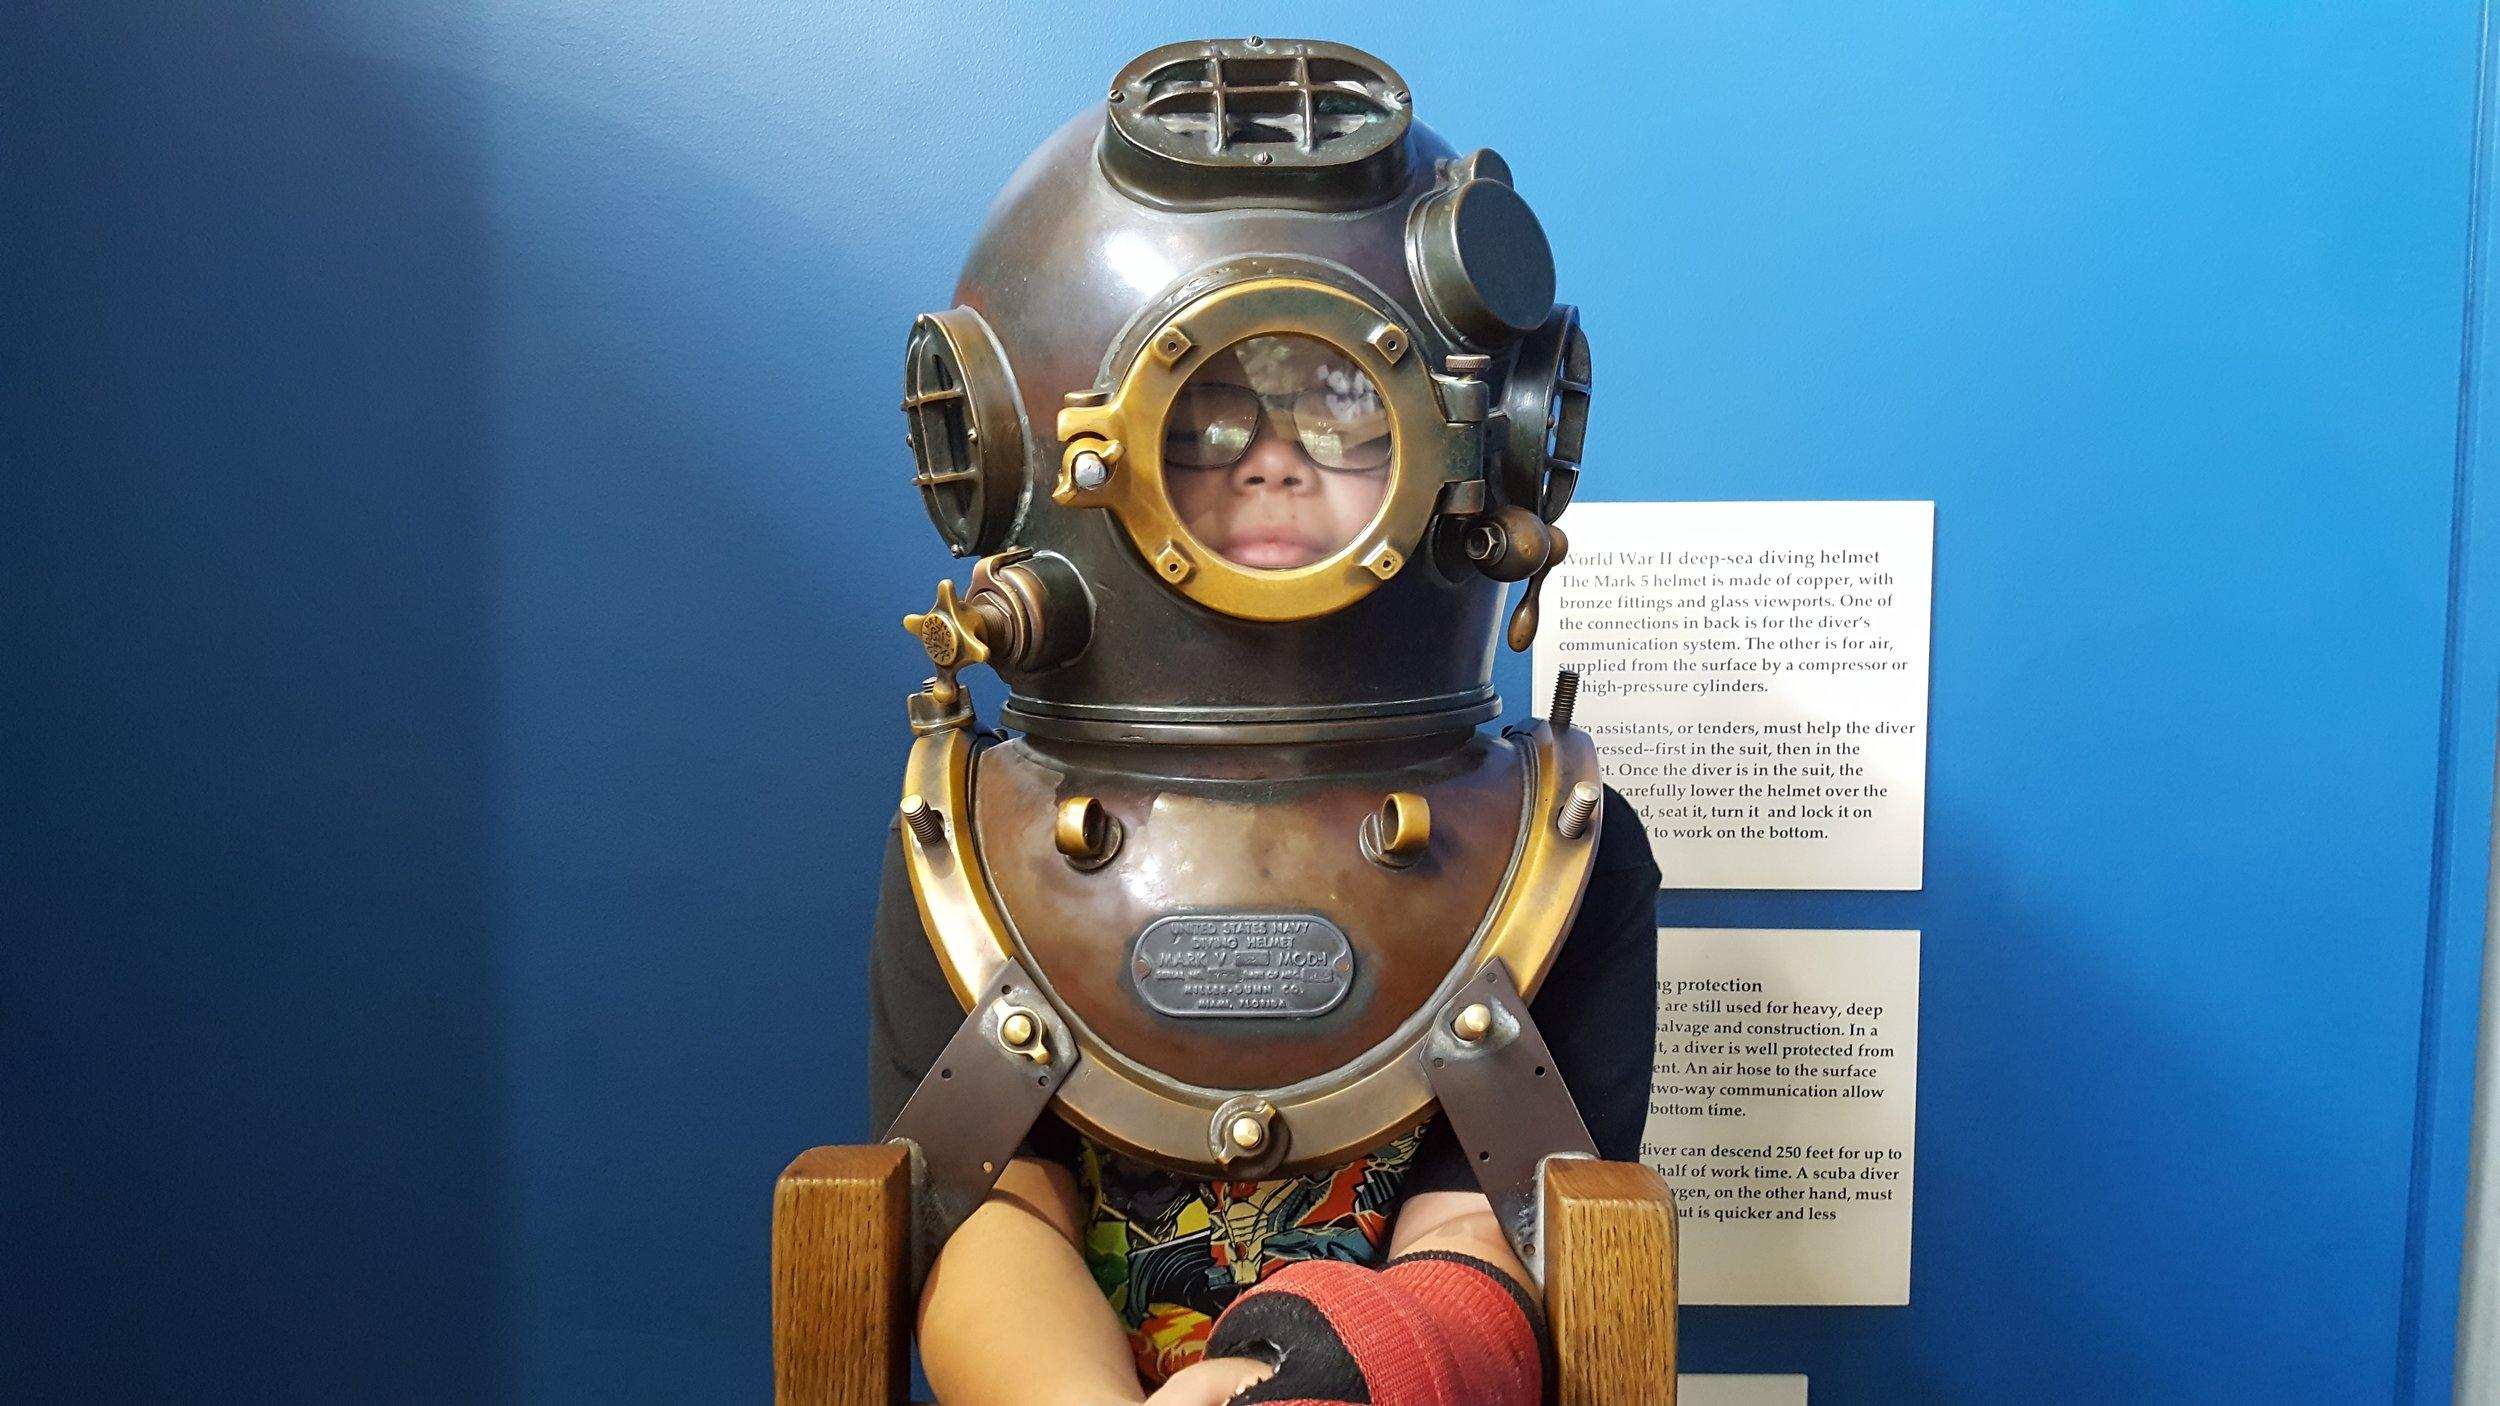 Oregon Coast Aquarium - Newport - What to do in Southern Oregon